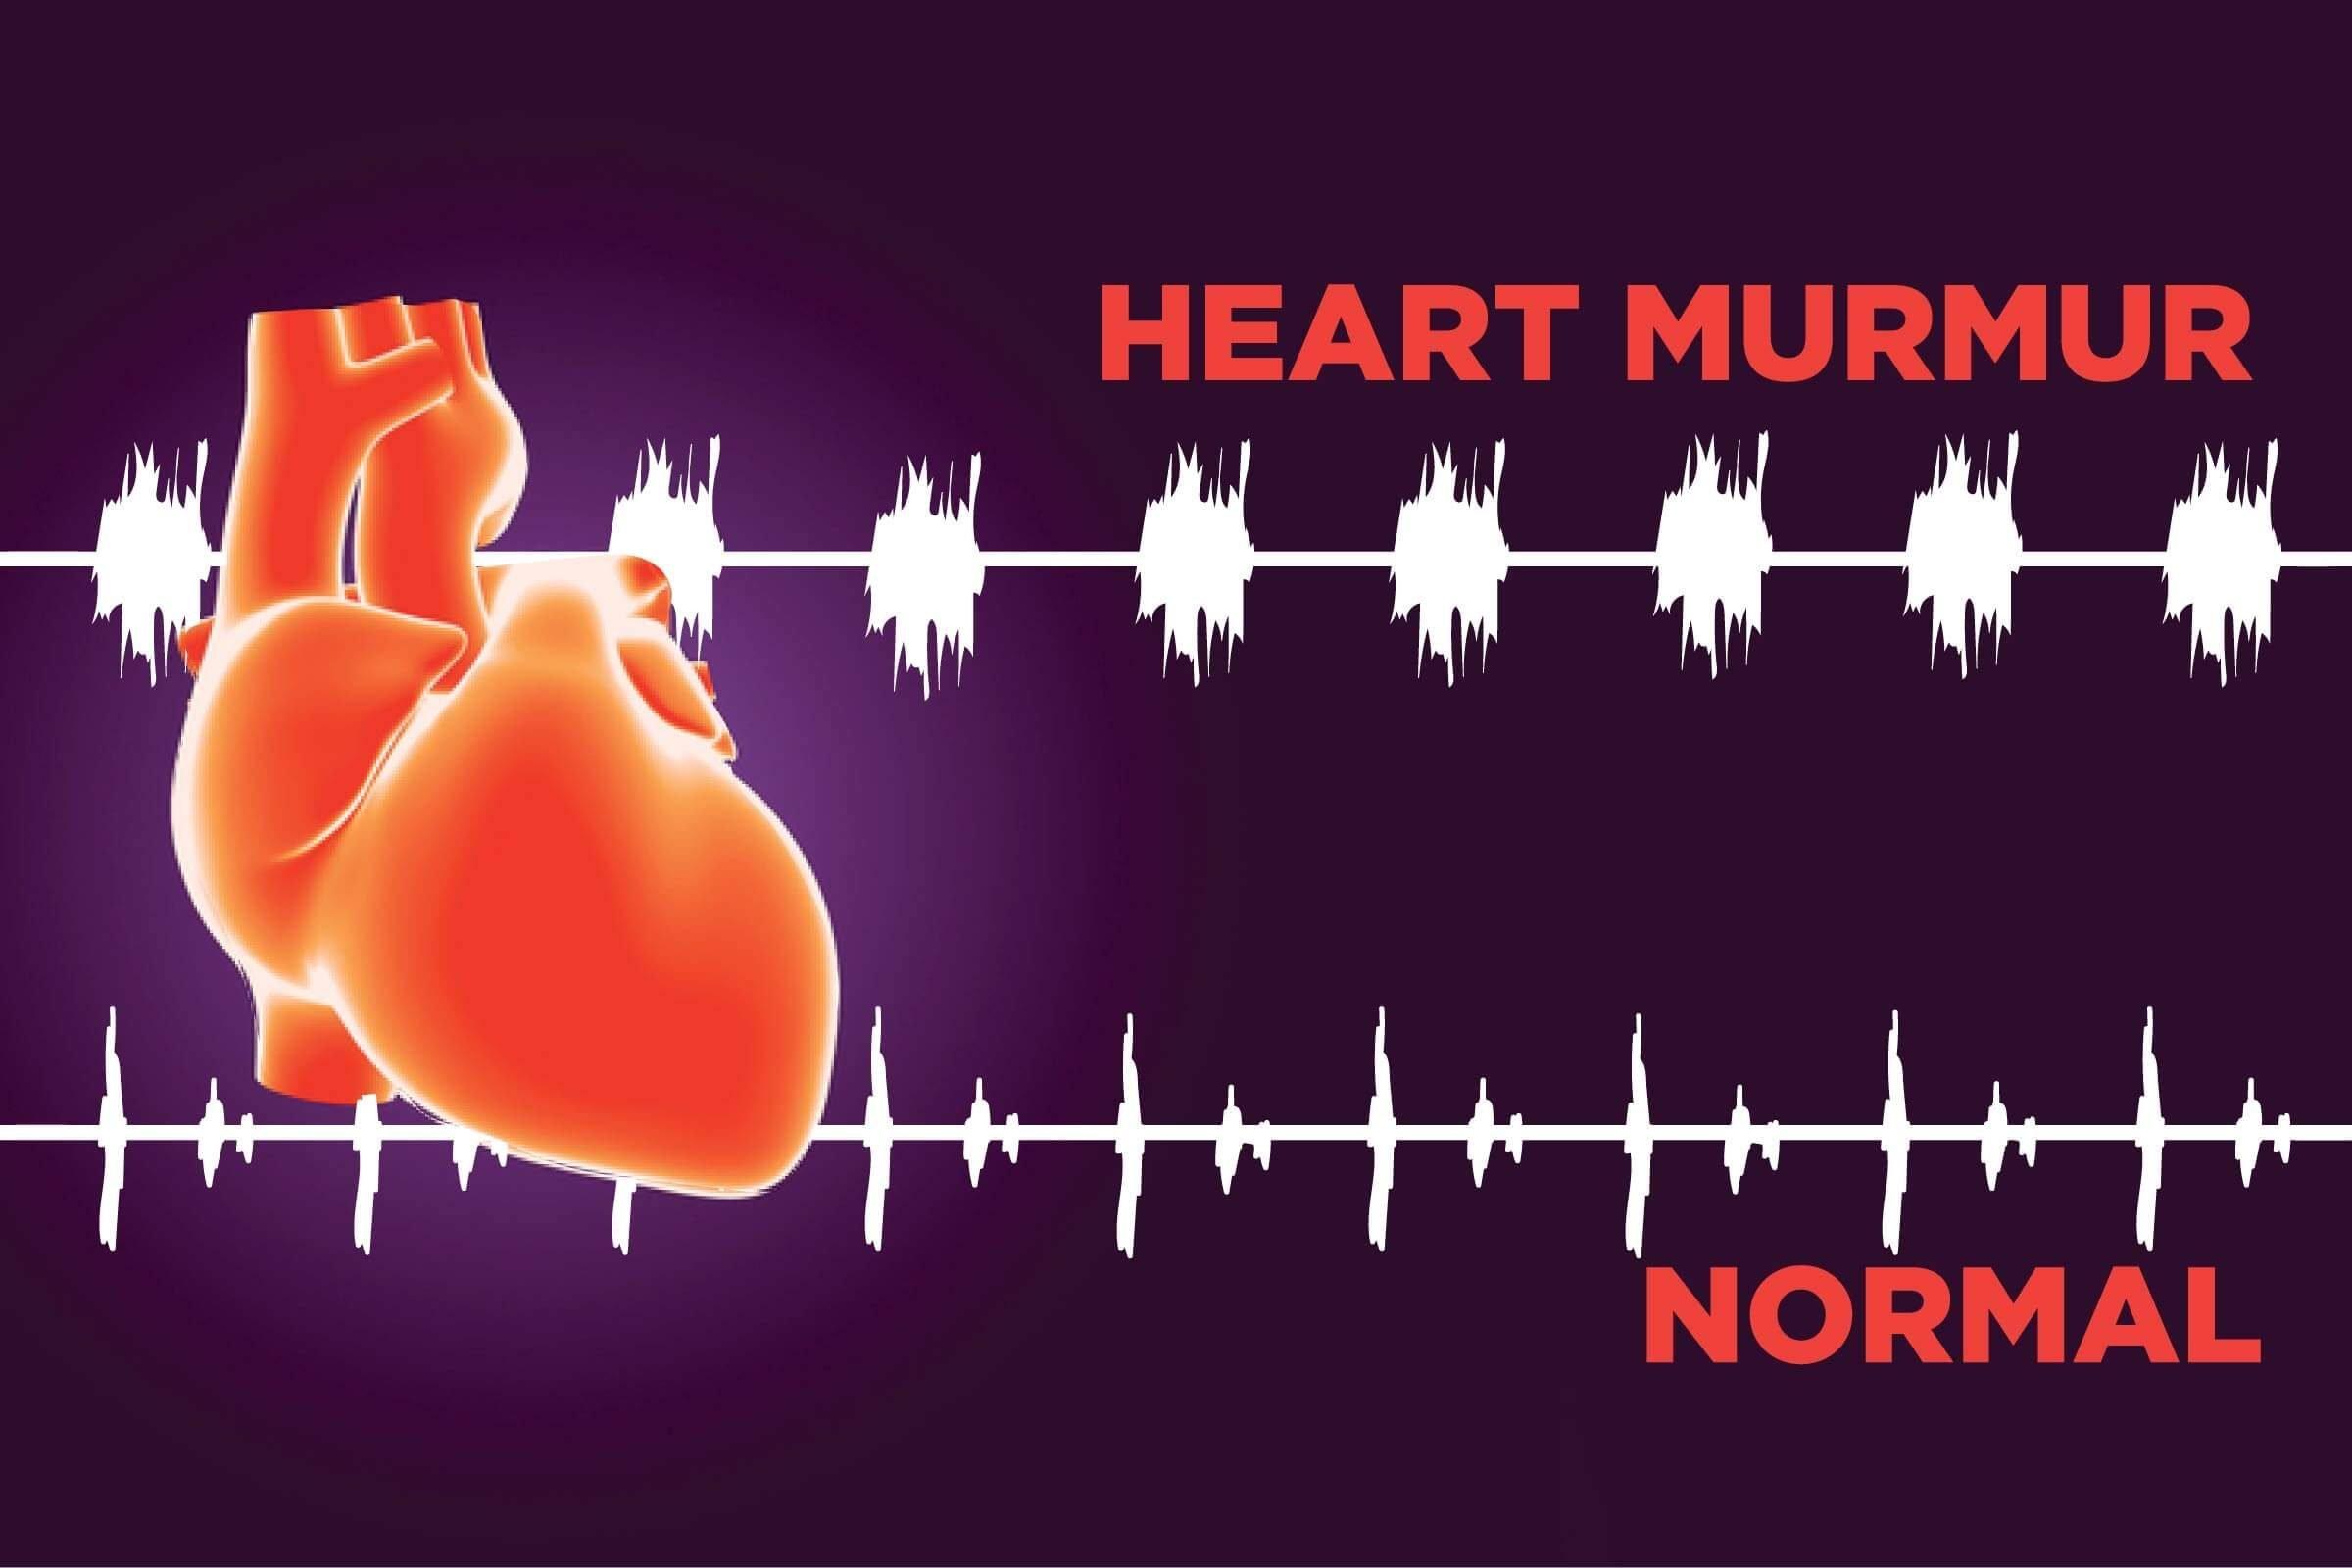 Adult heart in murmur